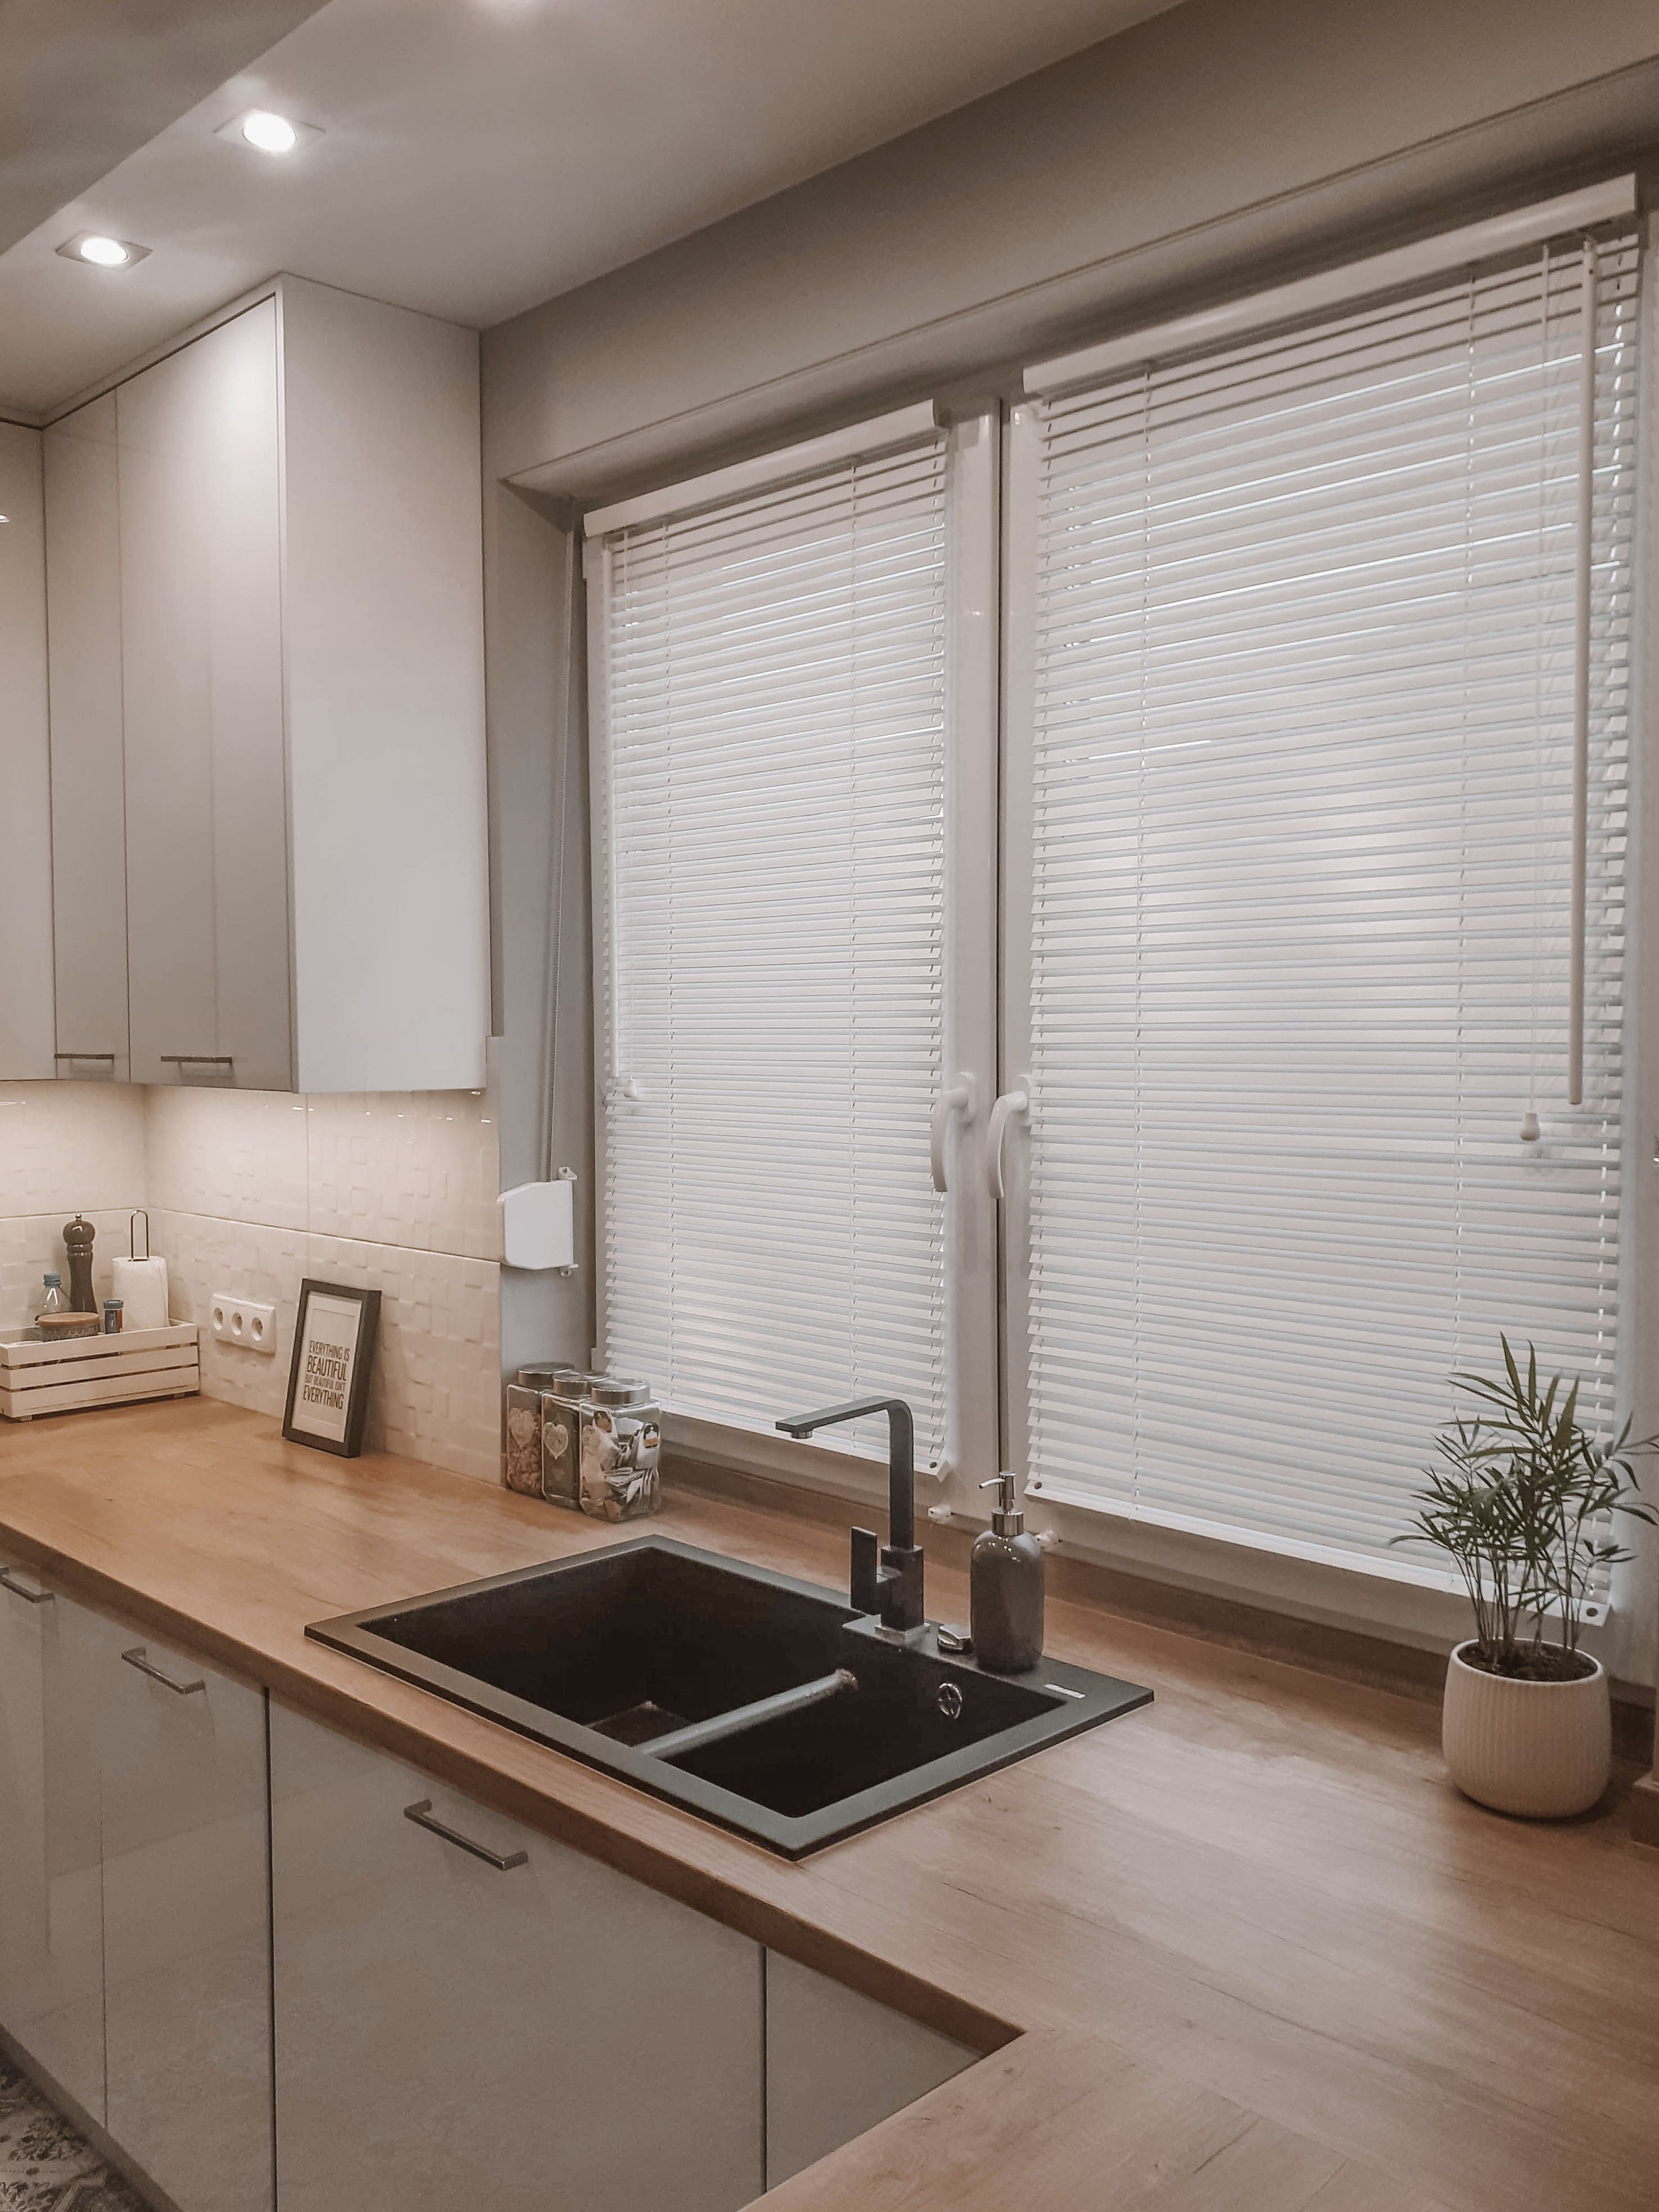 Biale Zaluzje Drewniane W Kuchni House Home Kitchen Interior